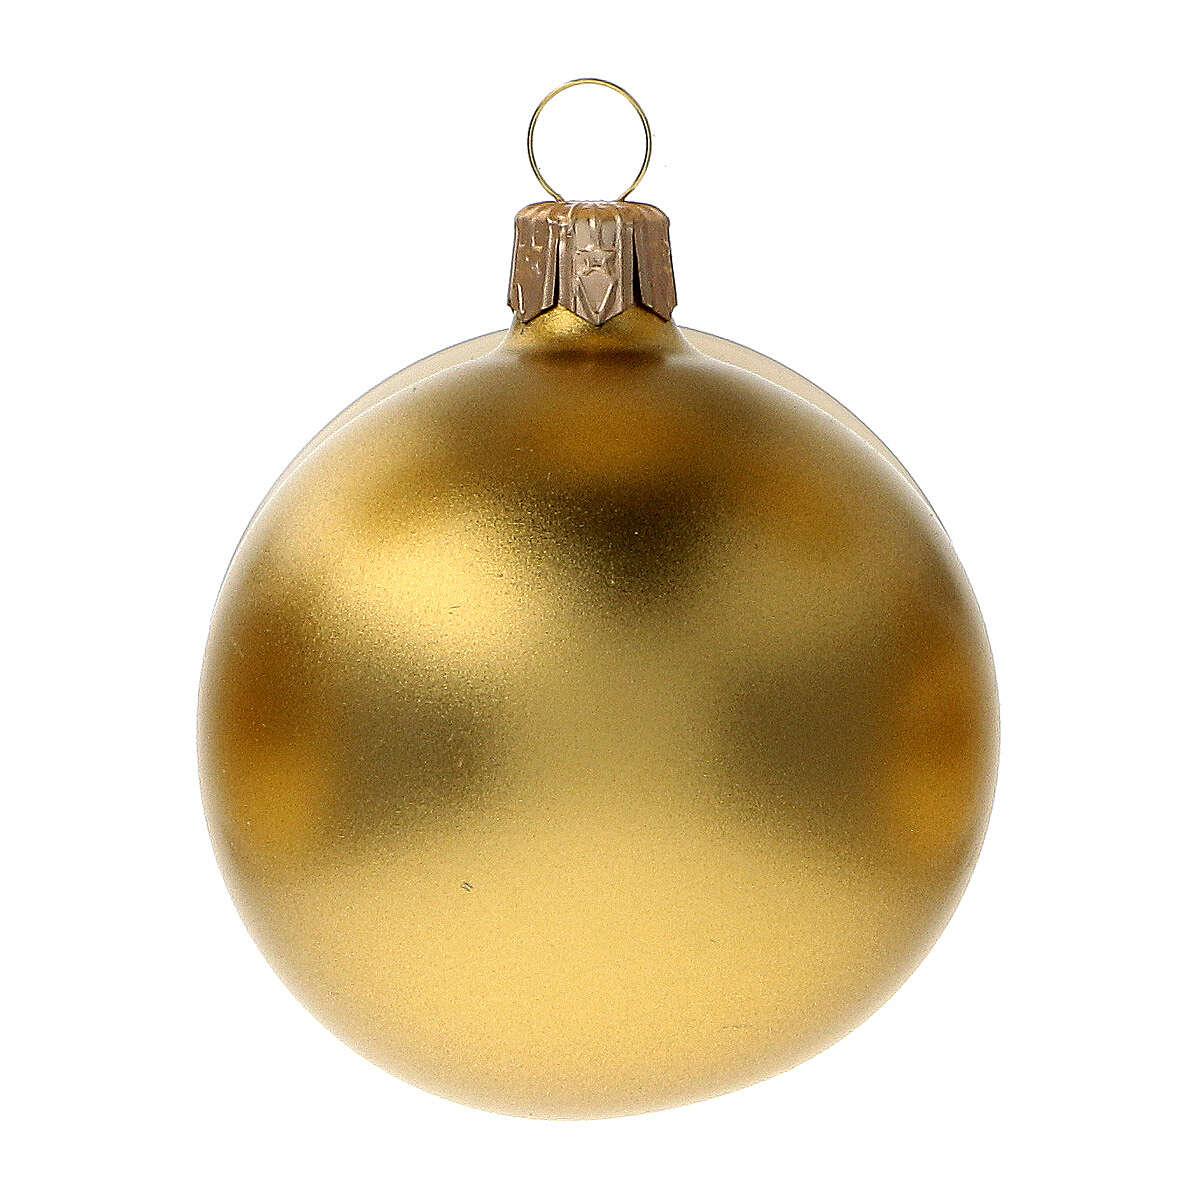 Palline addobbo Natale oro opaco satinato 60 mm vetro soffiato 6 pz 4